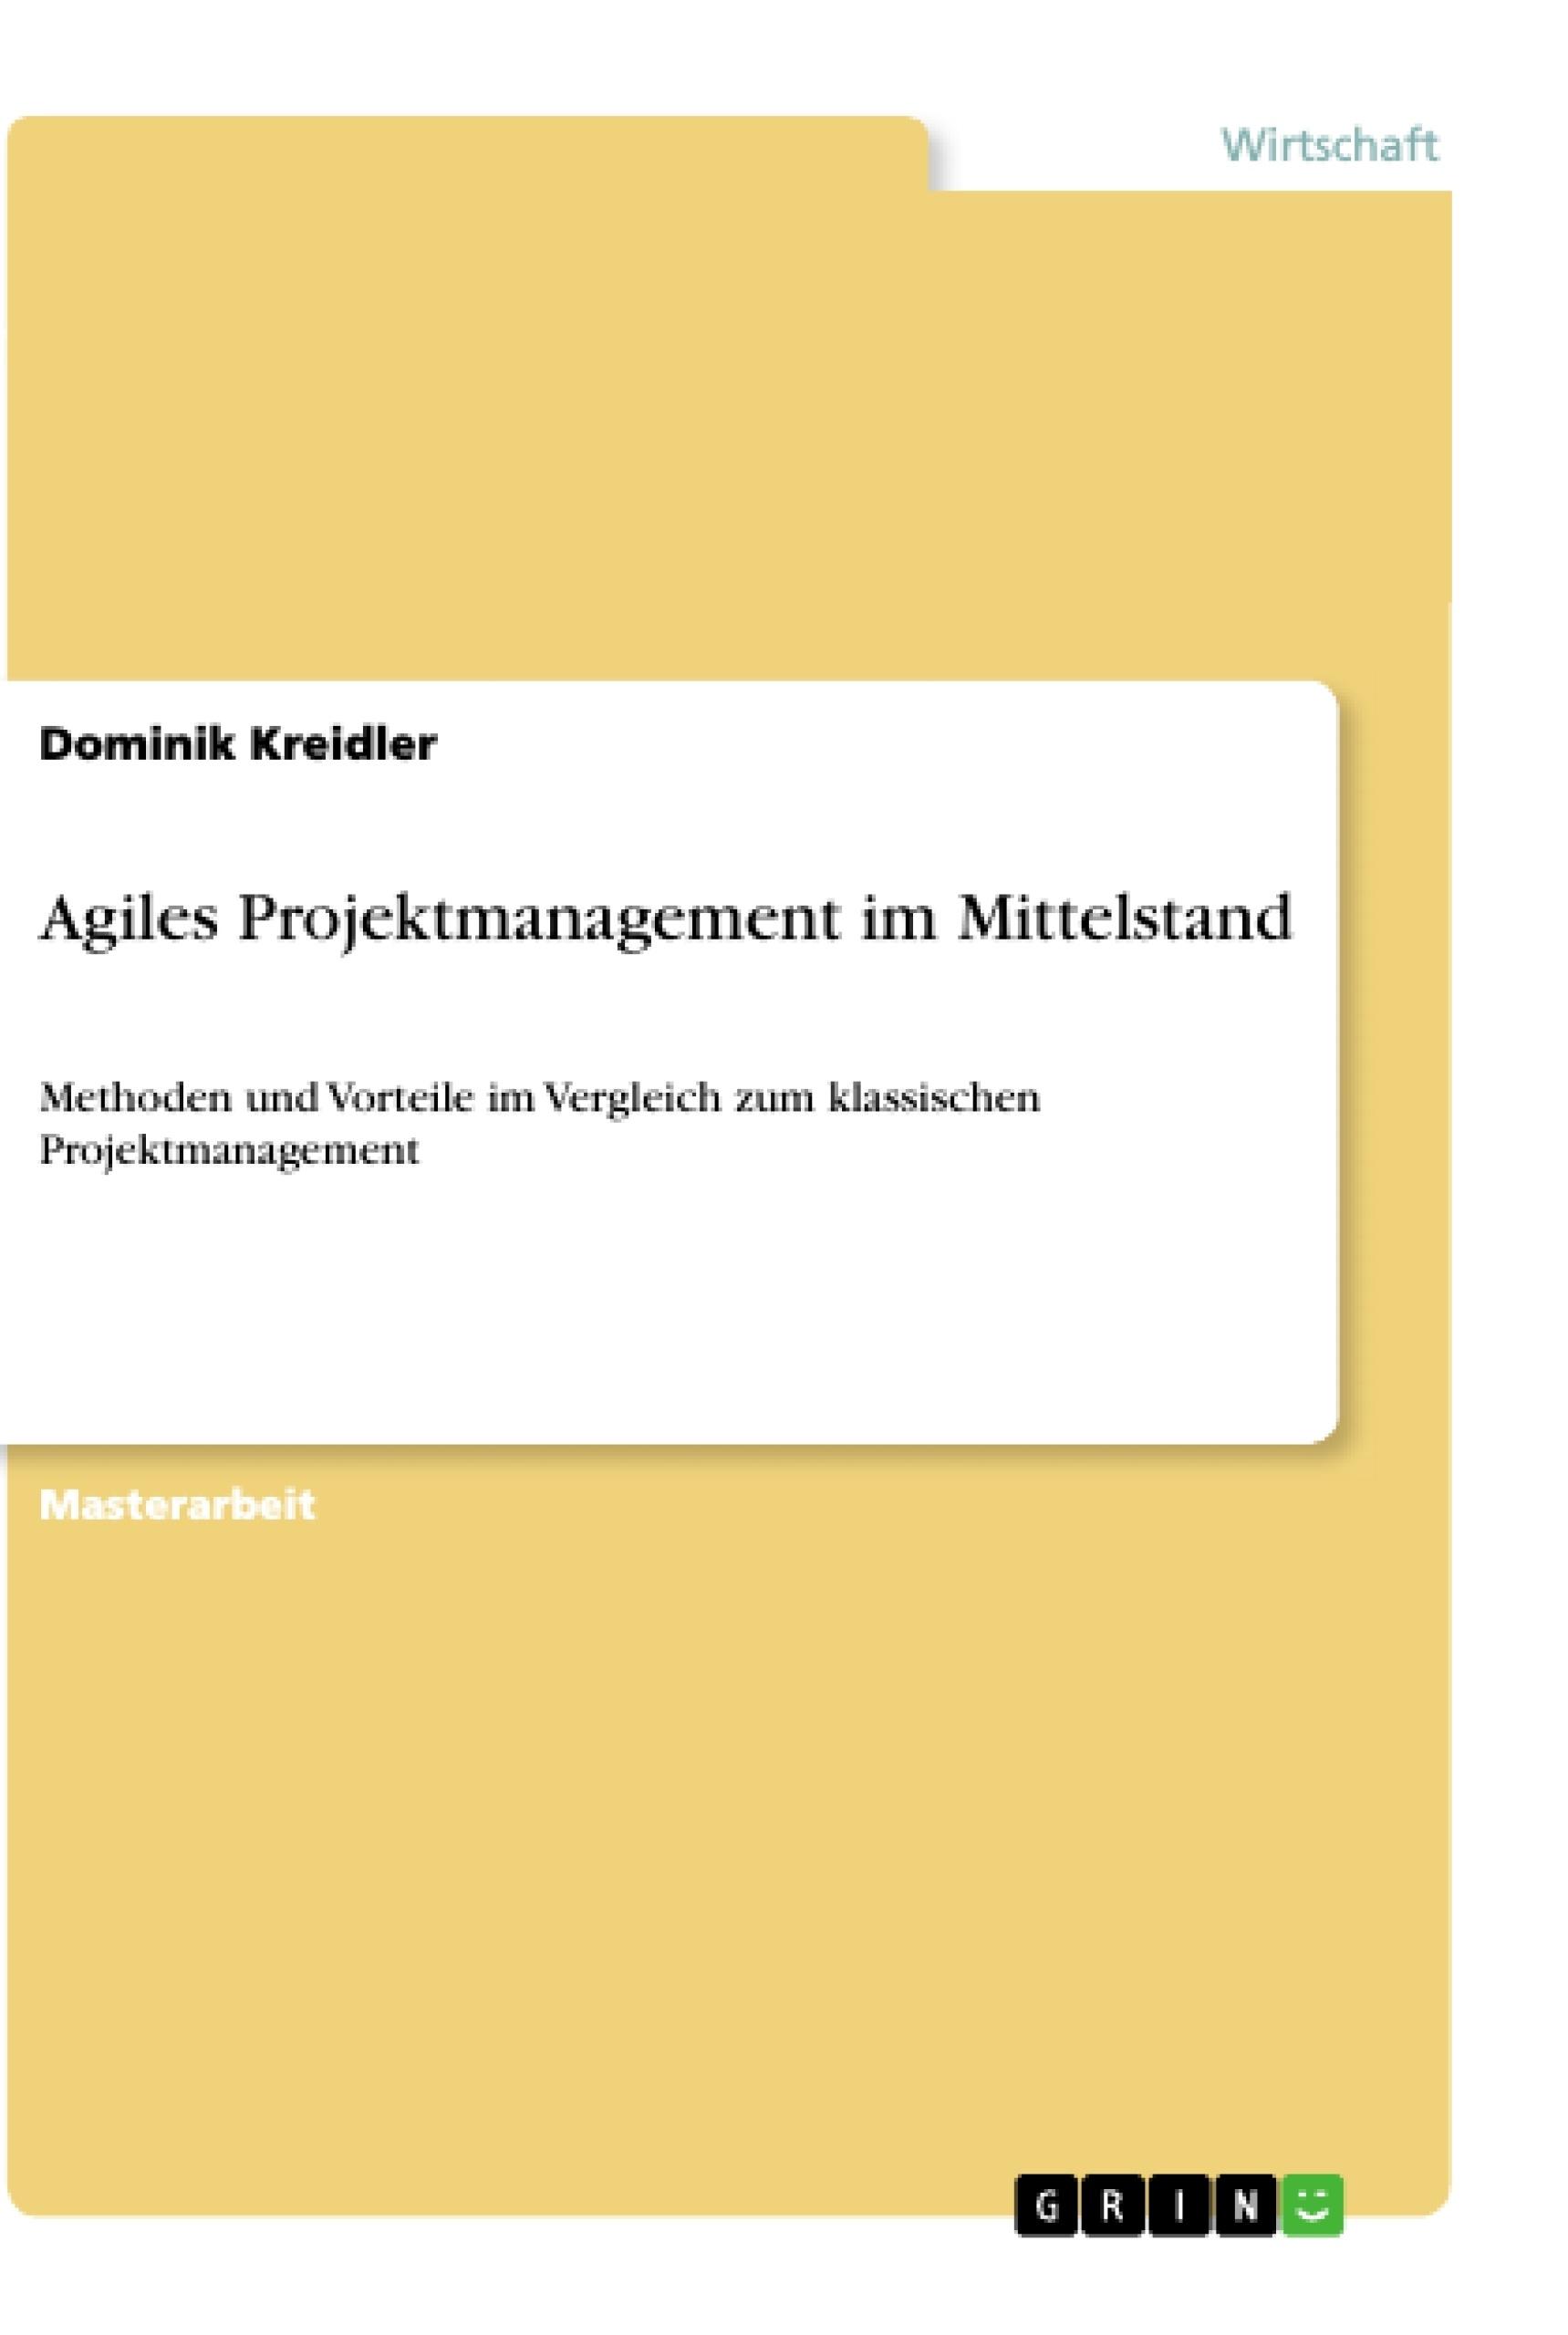 Titel: Agiles Projektmanagement im Mittelstand